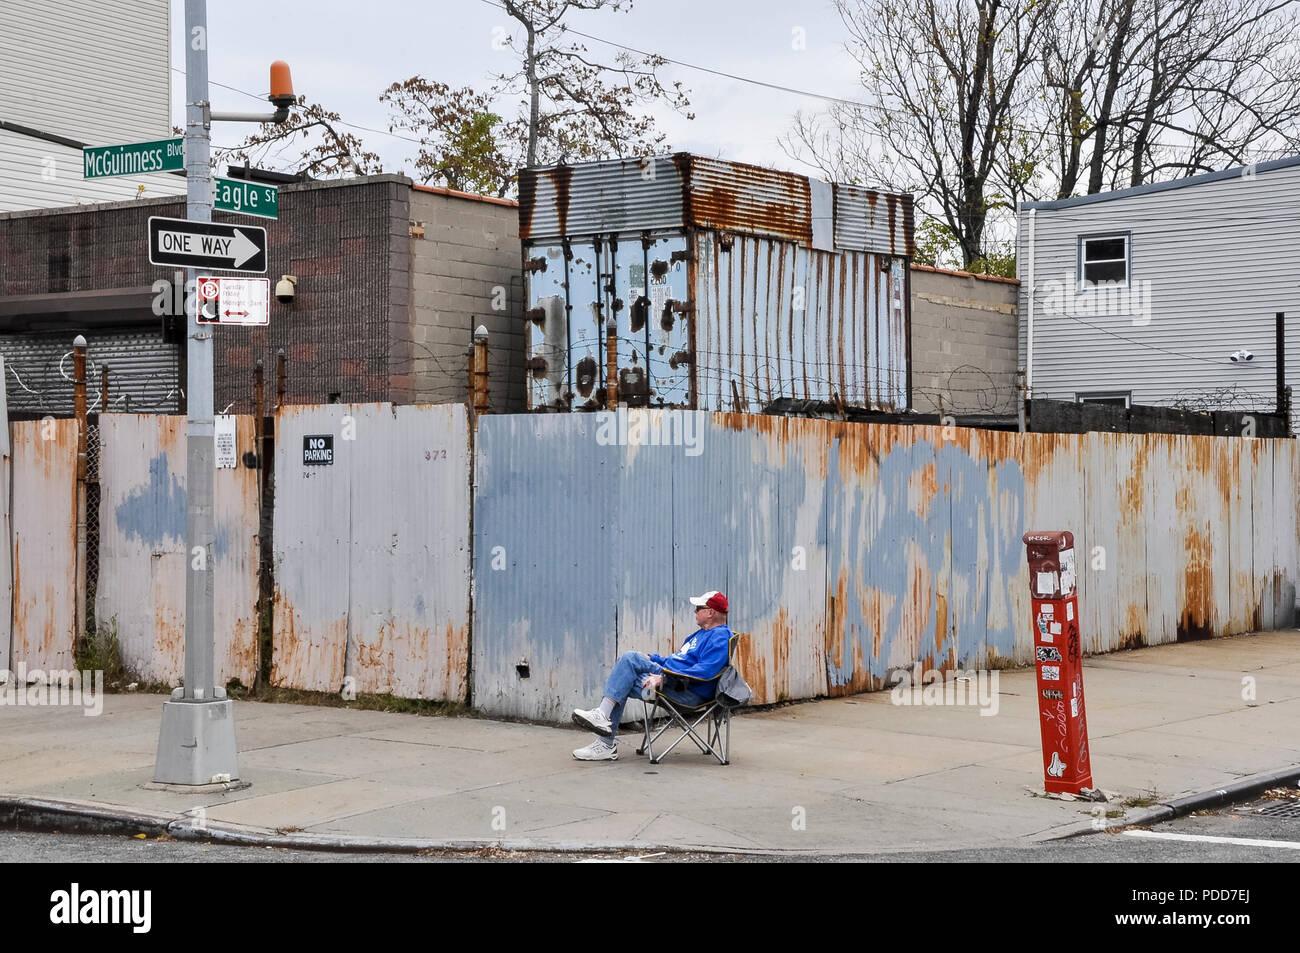 01-11-15, New York, USA. New York Marathon. A spectator watches the New York marathon runners as they pass his street. Photo: © Simon Grosset - Stock Image